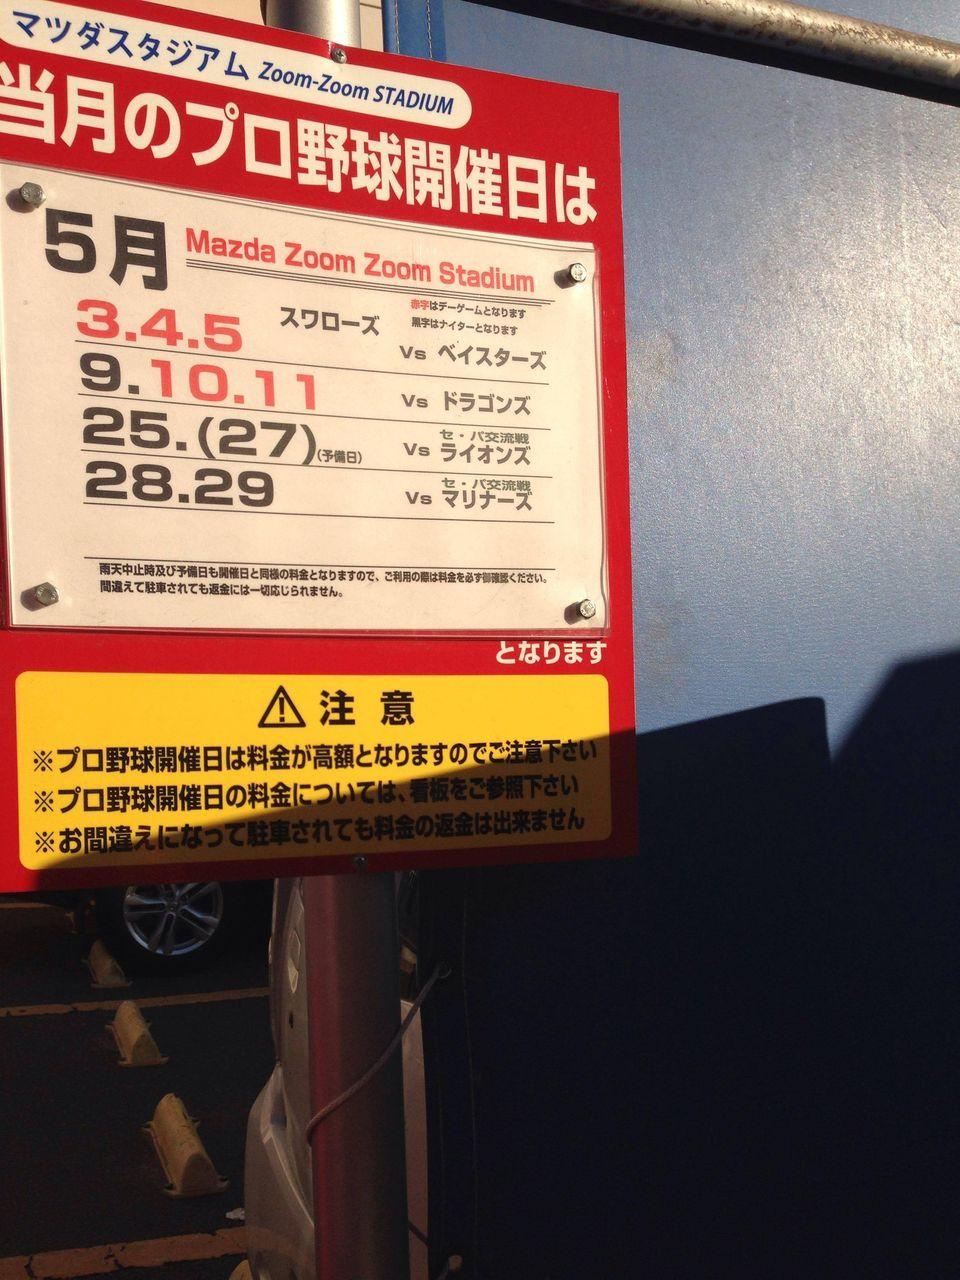 http://livedoor.blogimg.jp/nanjmagnus/imgs/5/9/591ac7d4.jpg